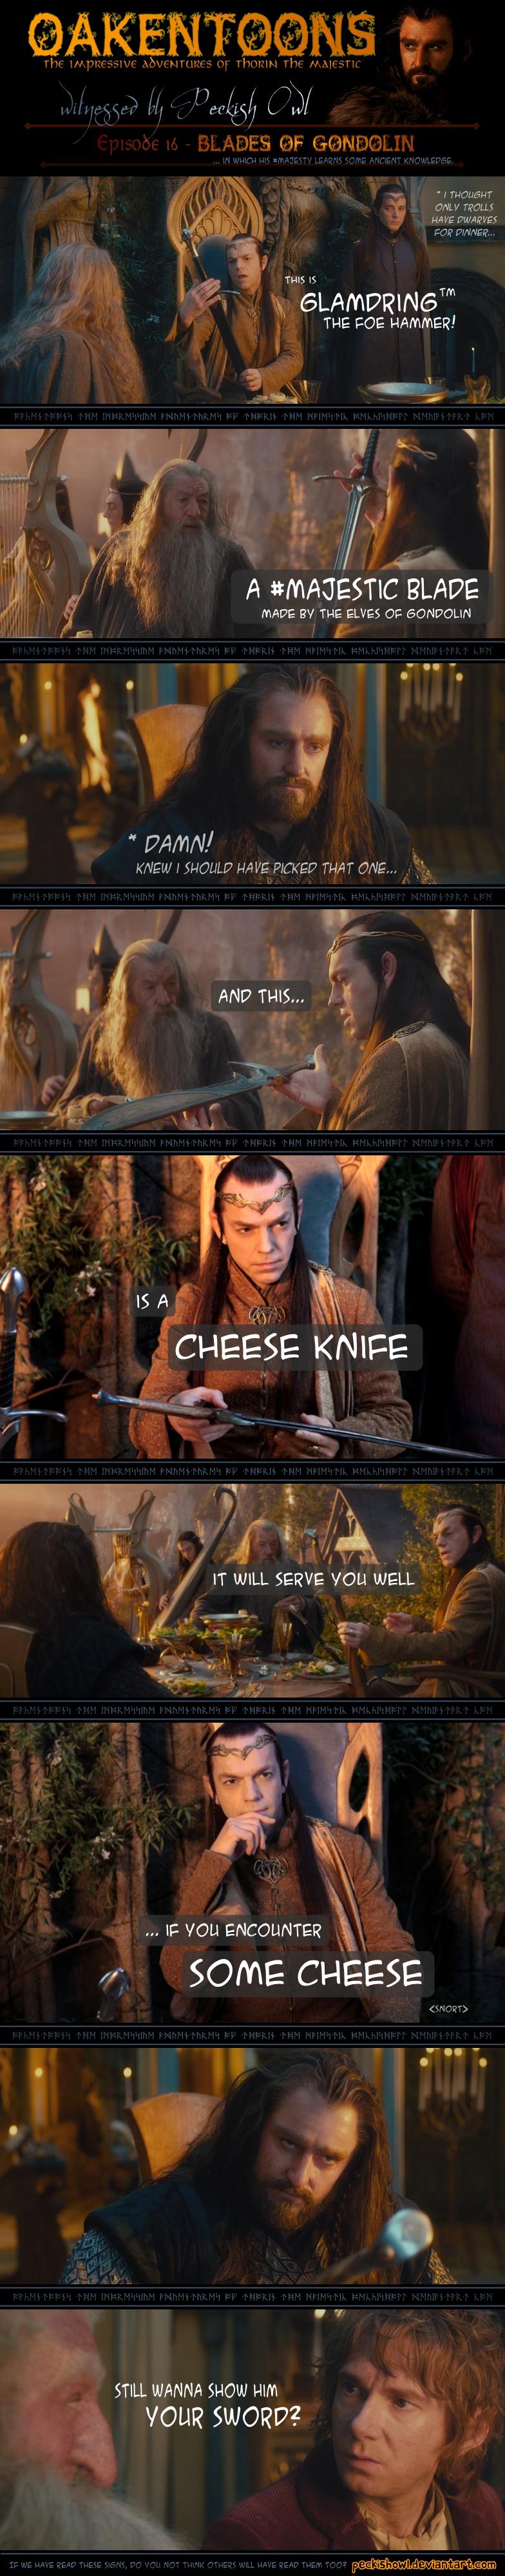 Oakentoon #16: Blades of Gondolin